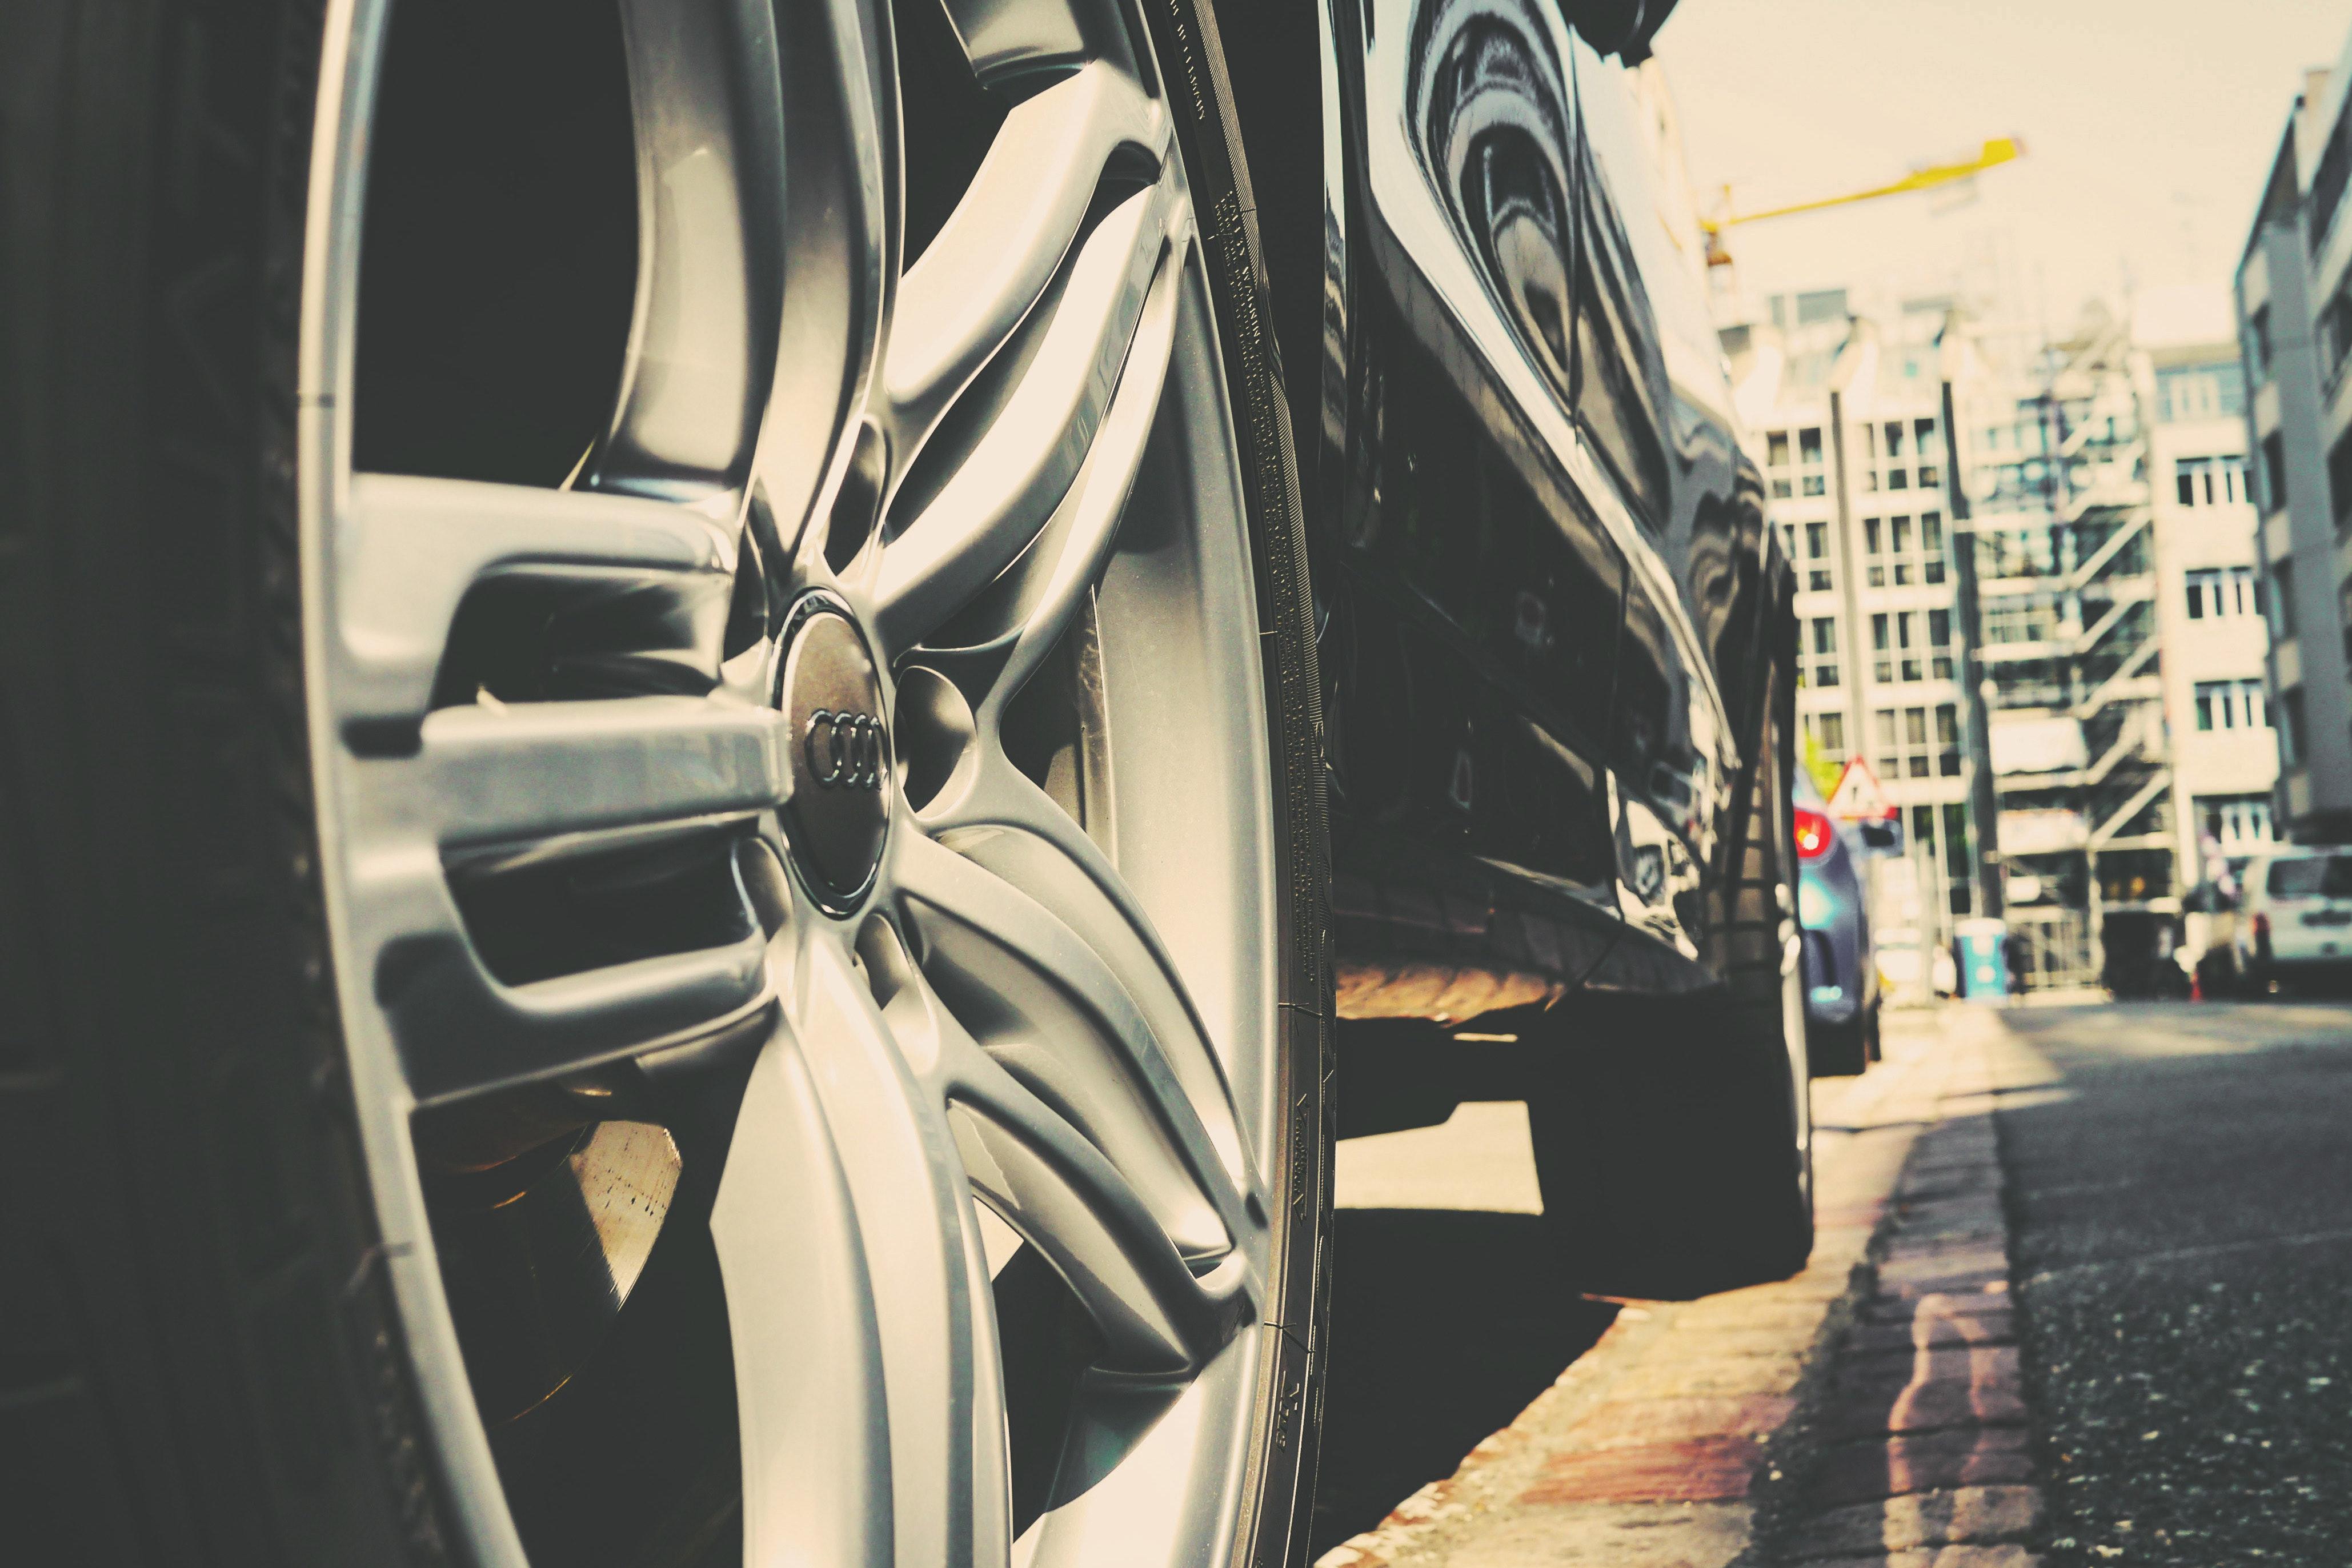 Wheel Cleaners